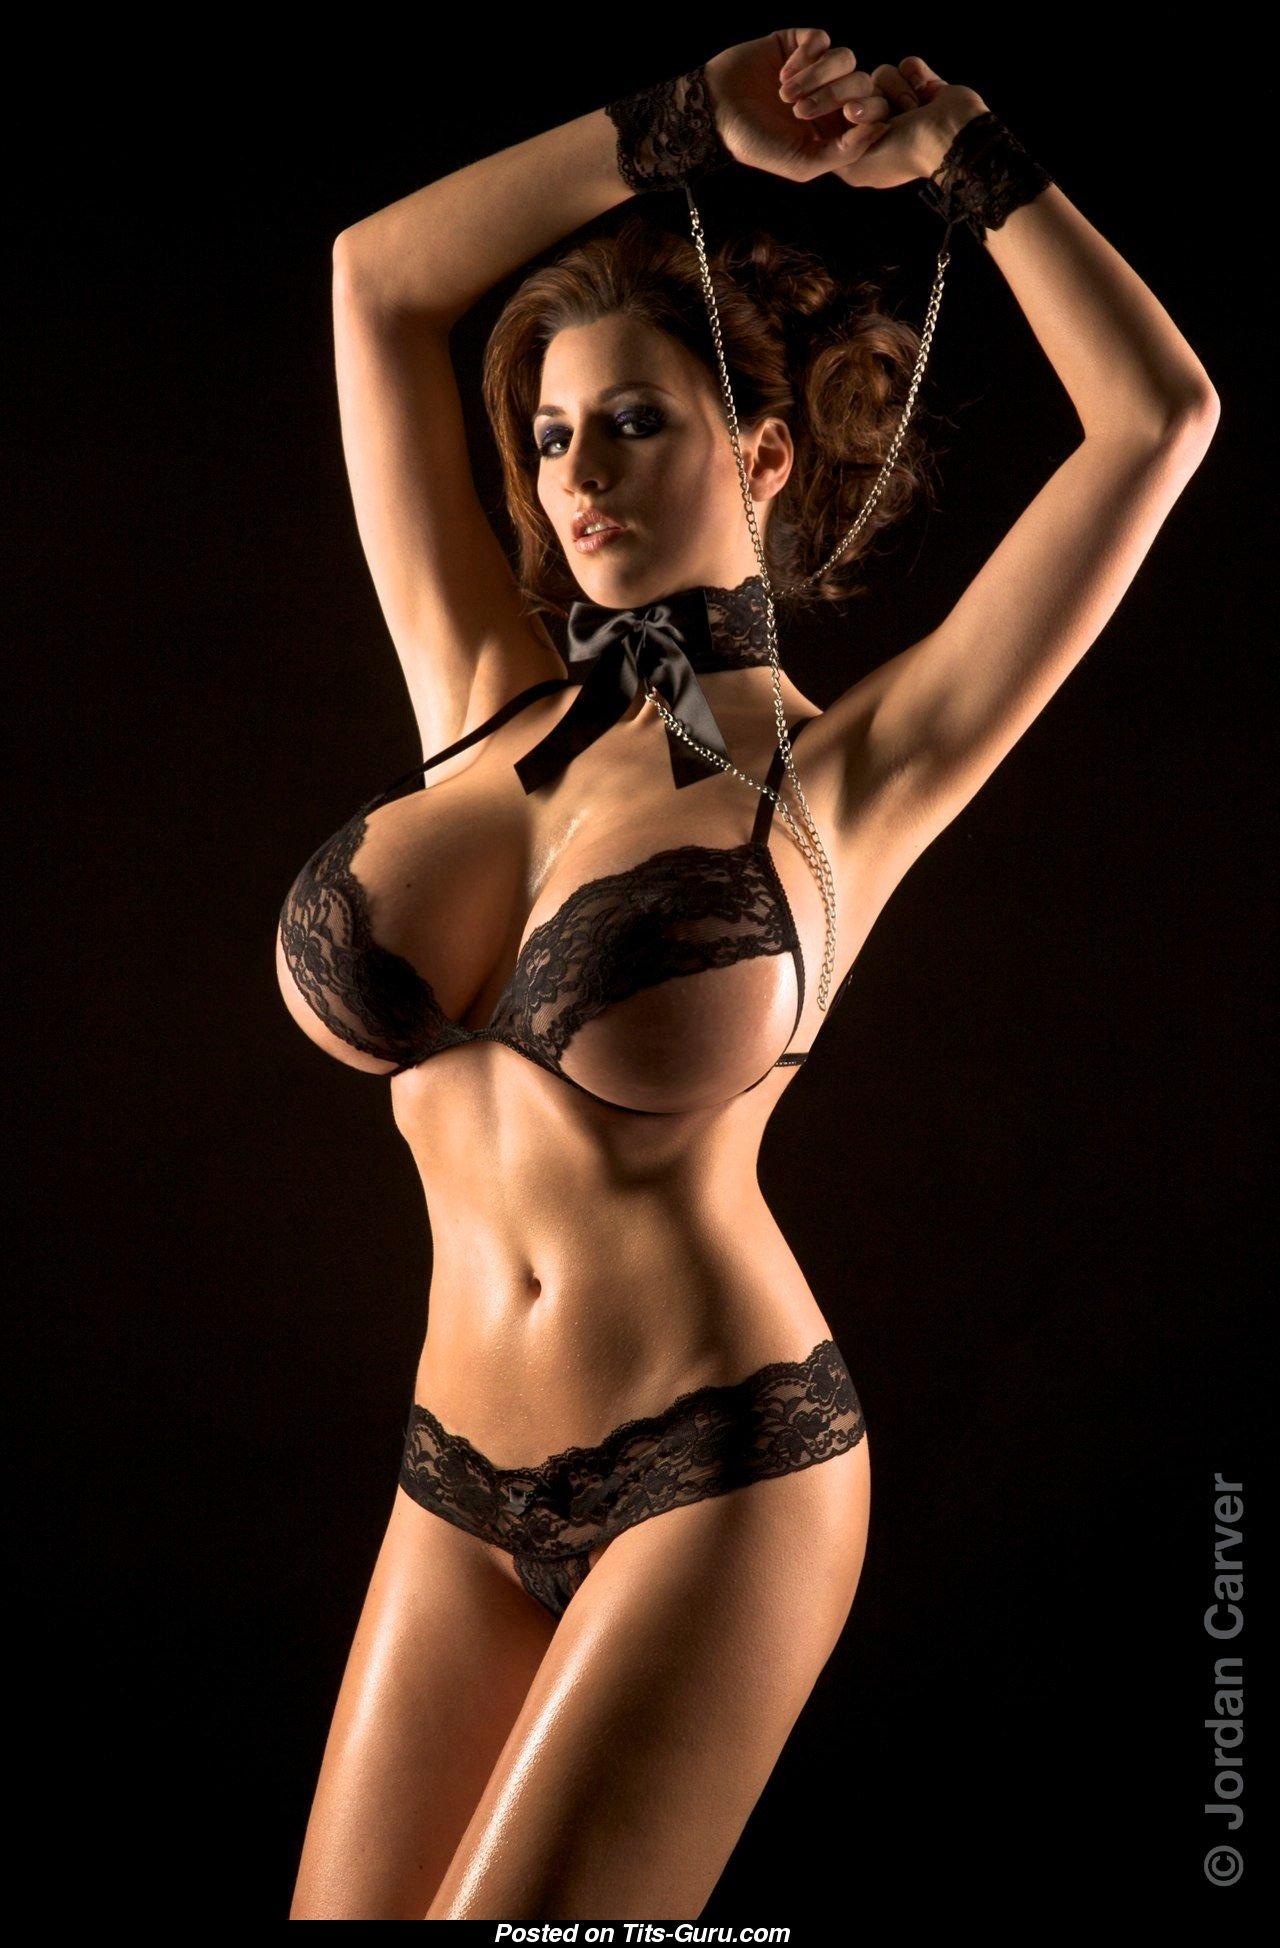 Bilder nackt gratis carver jordan 41 Sexiest